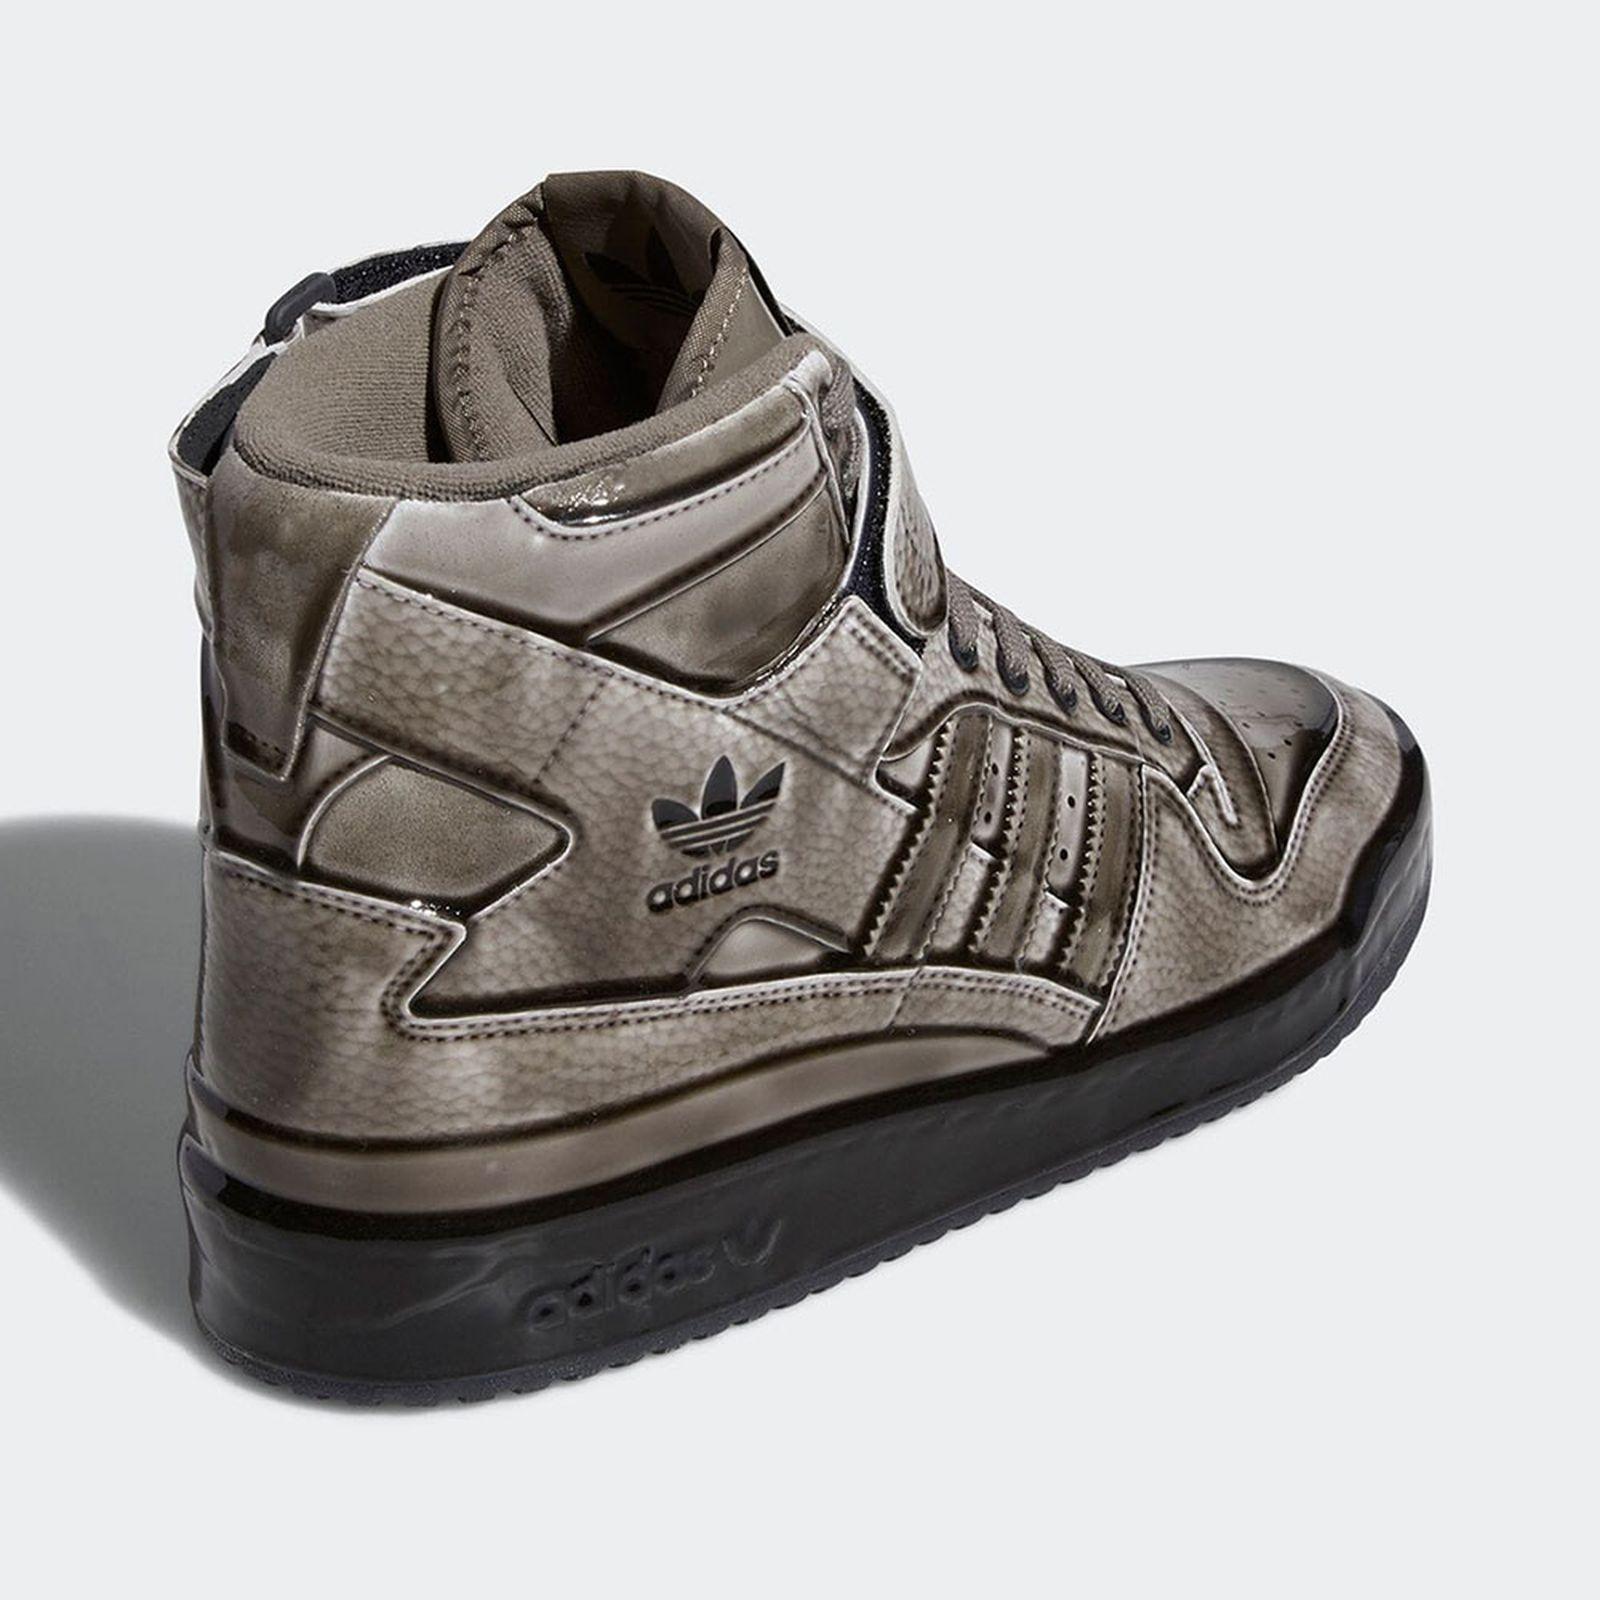 jeremy-scott-adidas-forum-hi-release-date-price-16